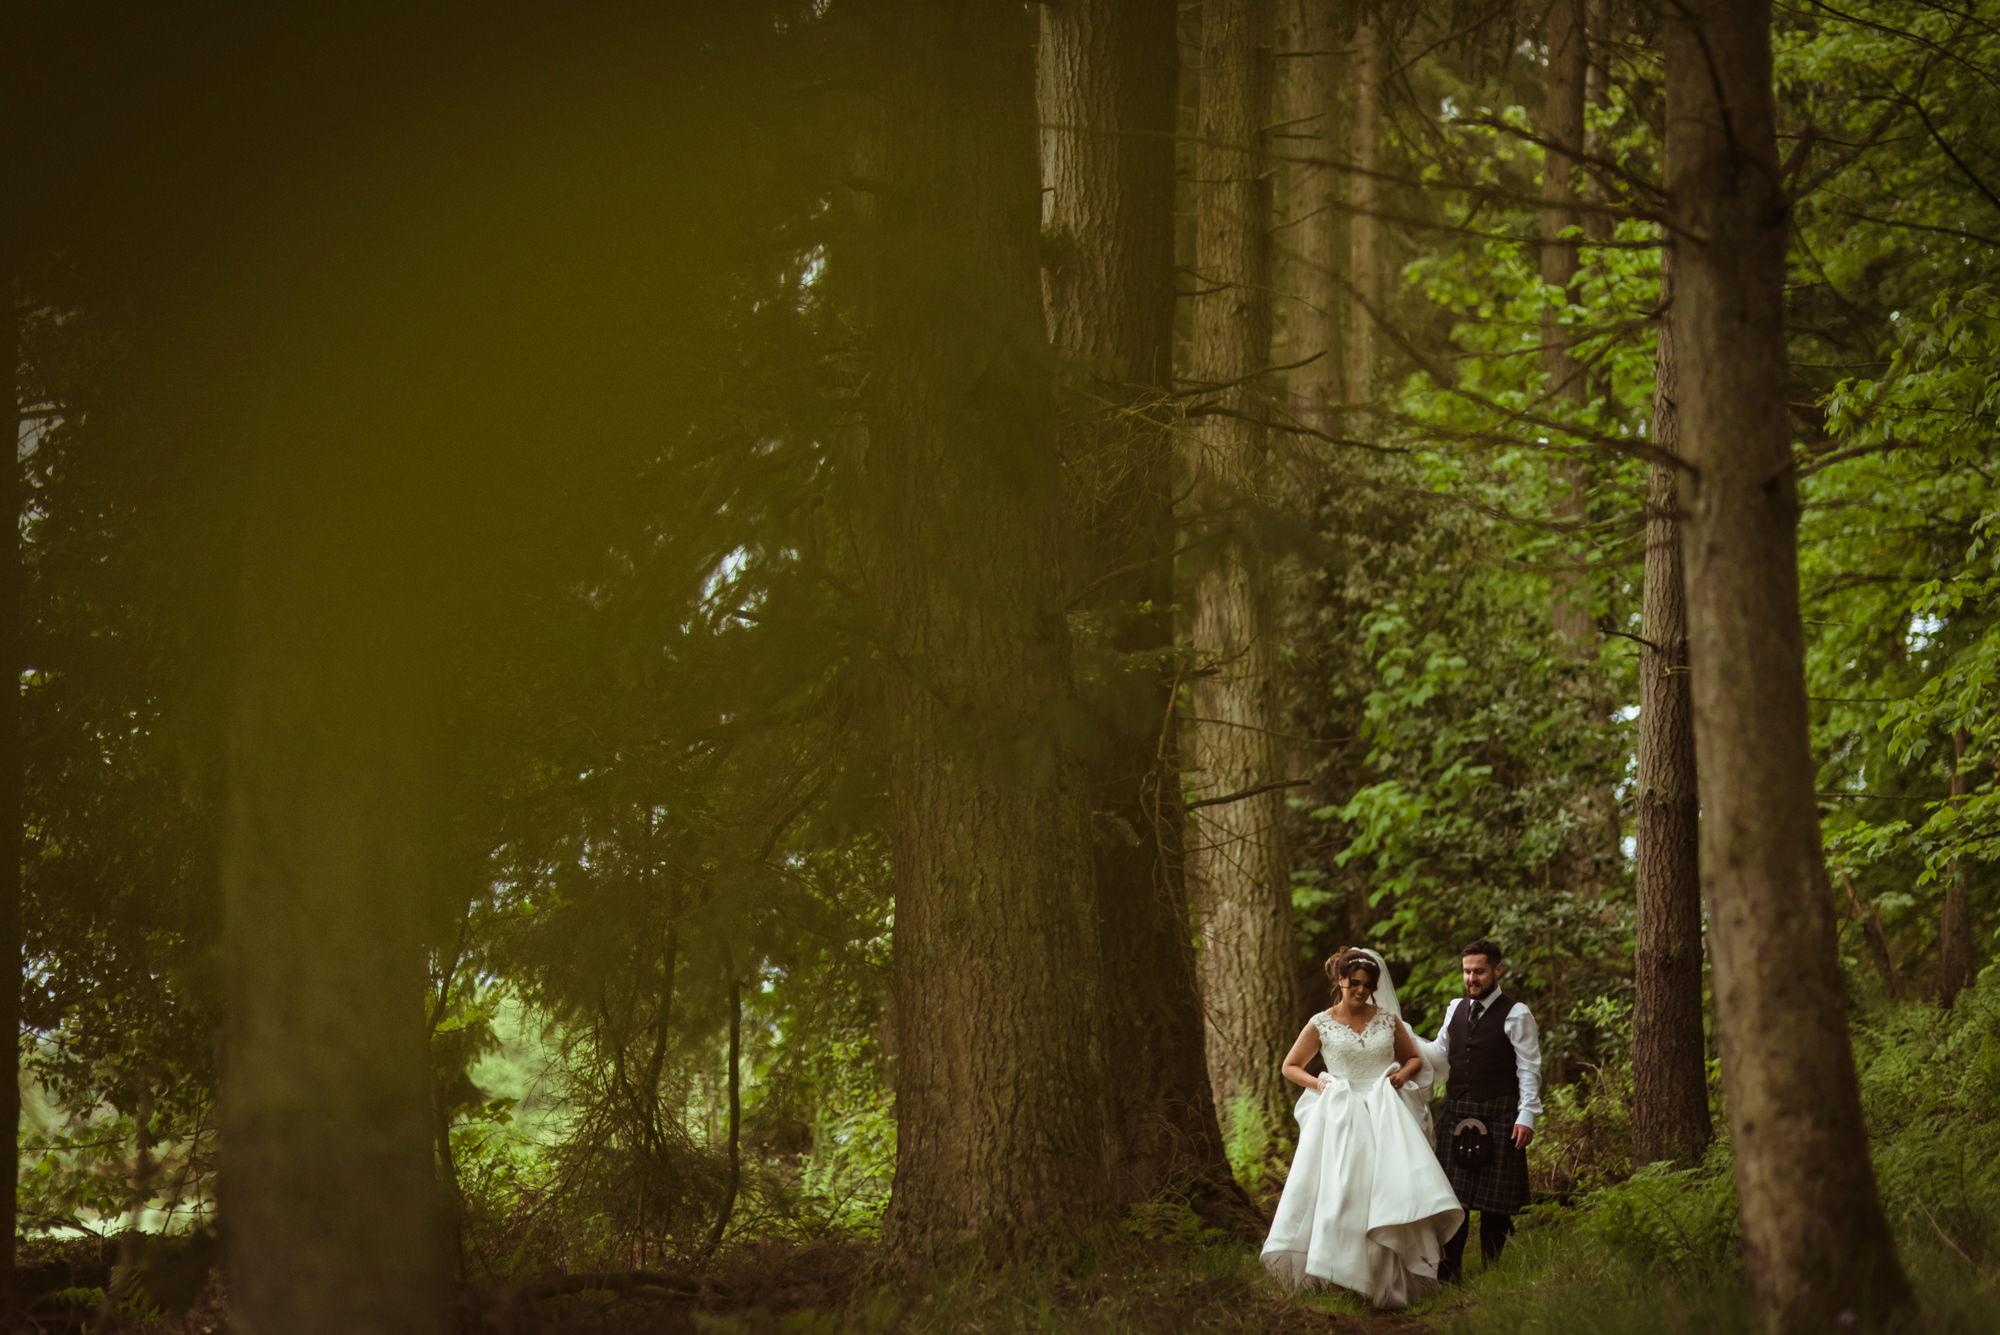 wedding-photographer-gleddoch-house.jpg